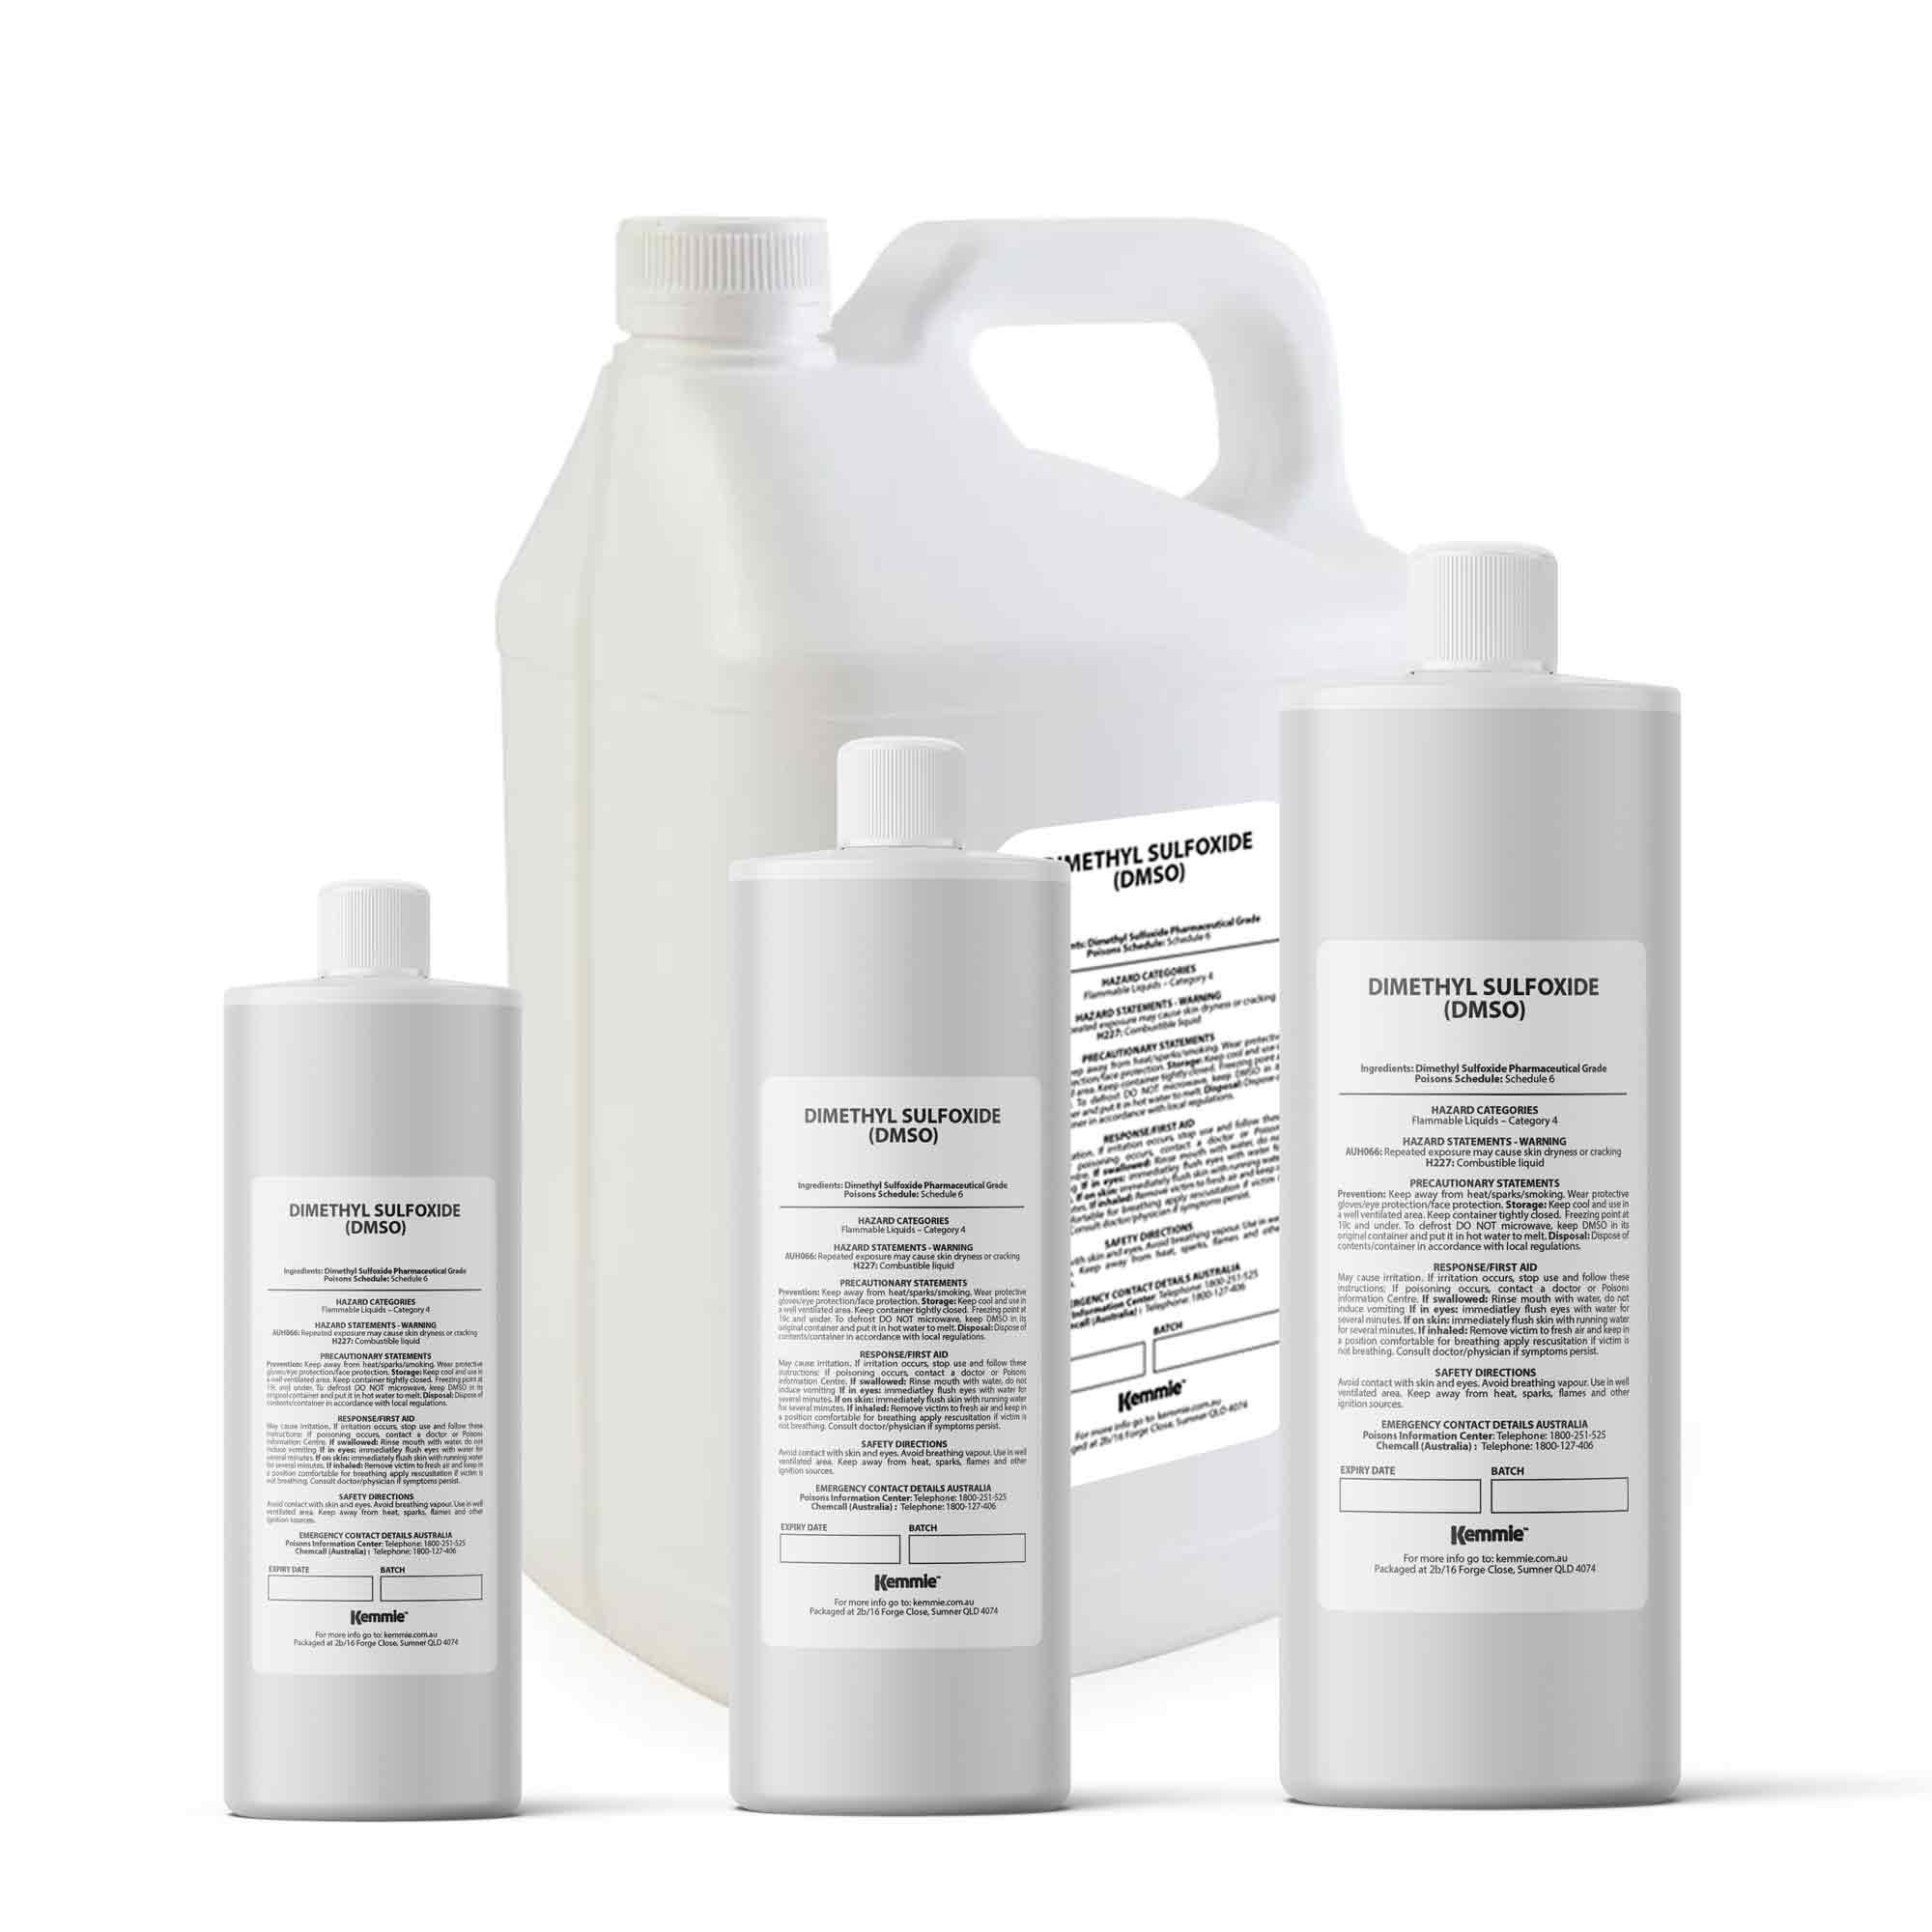 DMSO Liquid Dimethyl Sulfoxide 99.9% Pure Pharmaceutical Grade Solvent Bulk Size